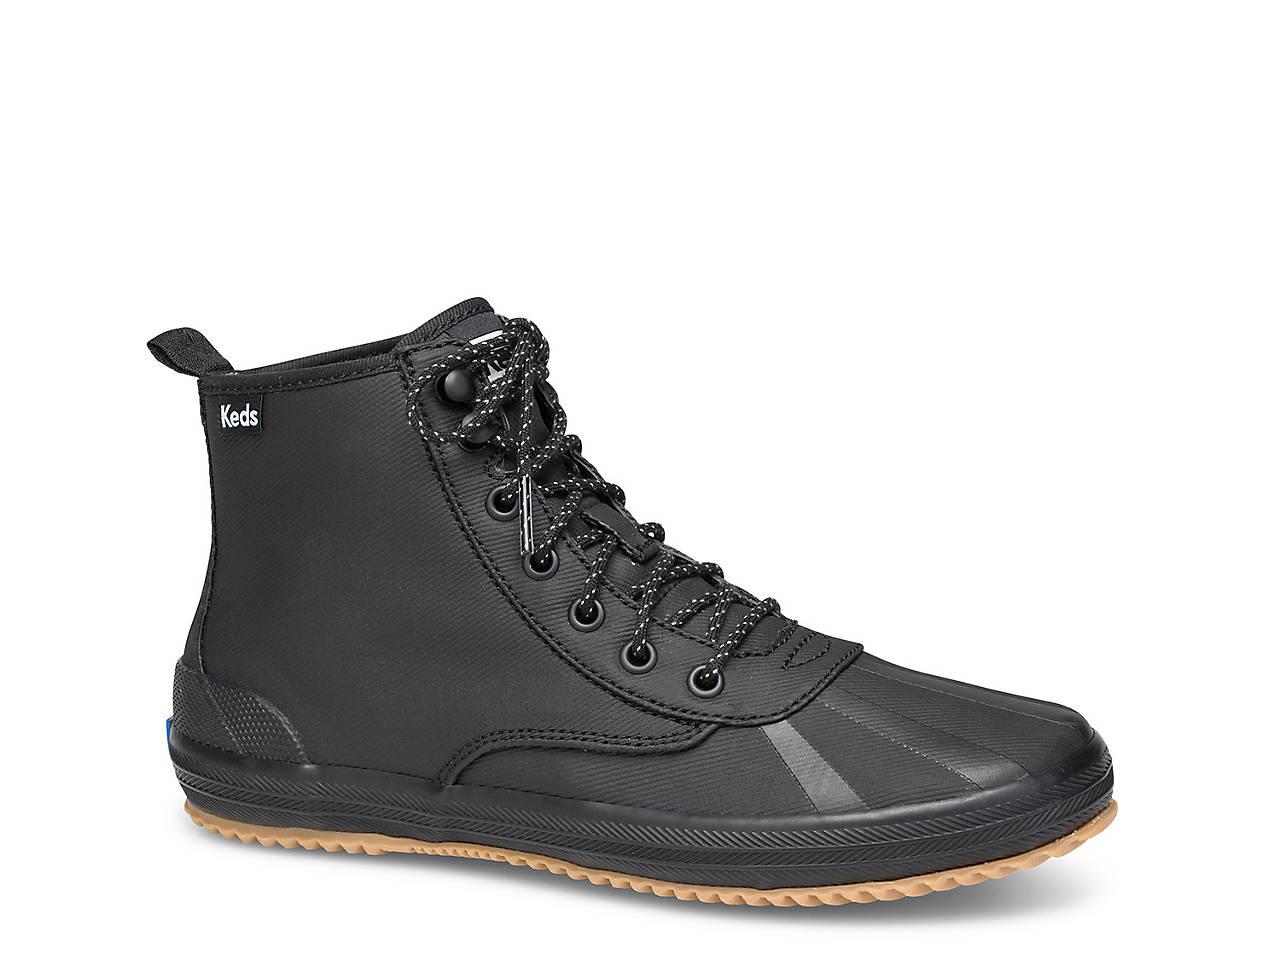 hot sales f316a 1f802 Keds Scout Rain Boot - Women s Women s Shoes   DSW